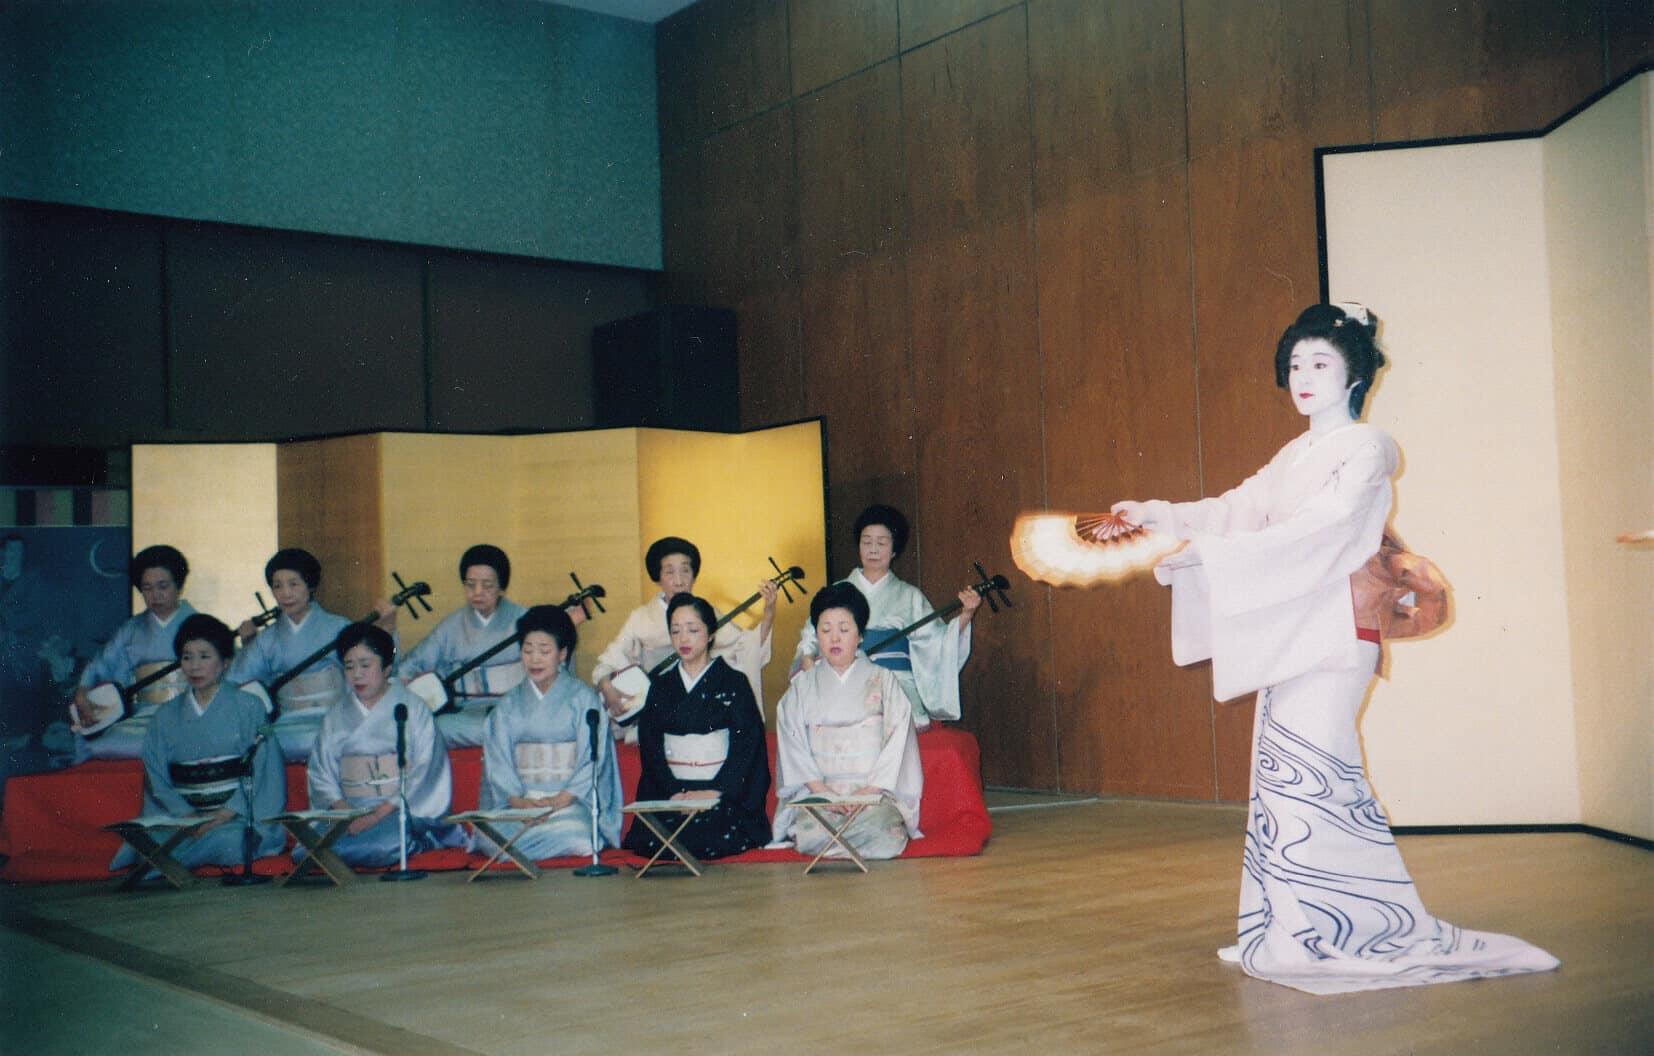 Geisha dancing with geisha accompaniment